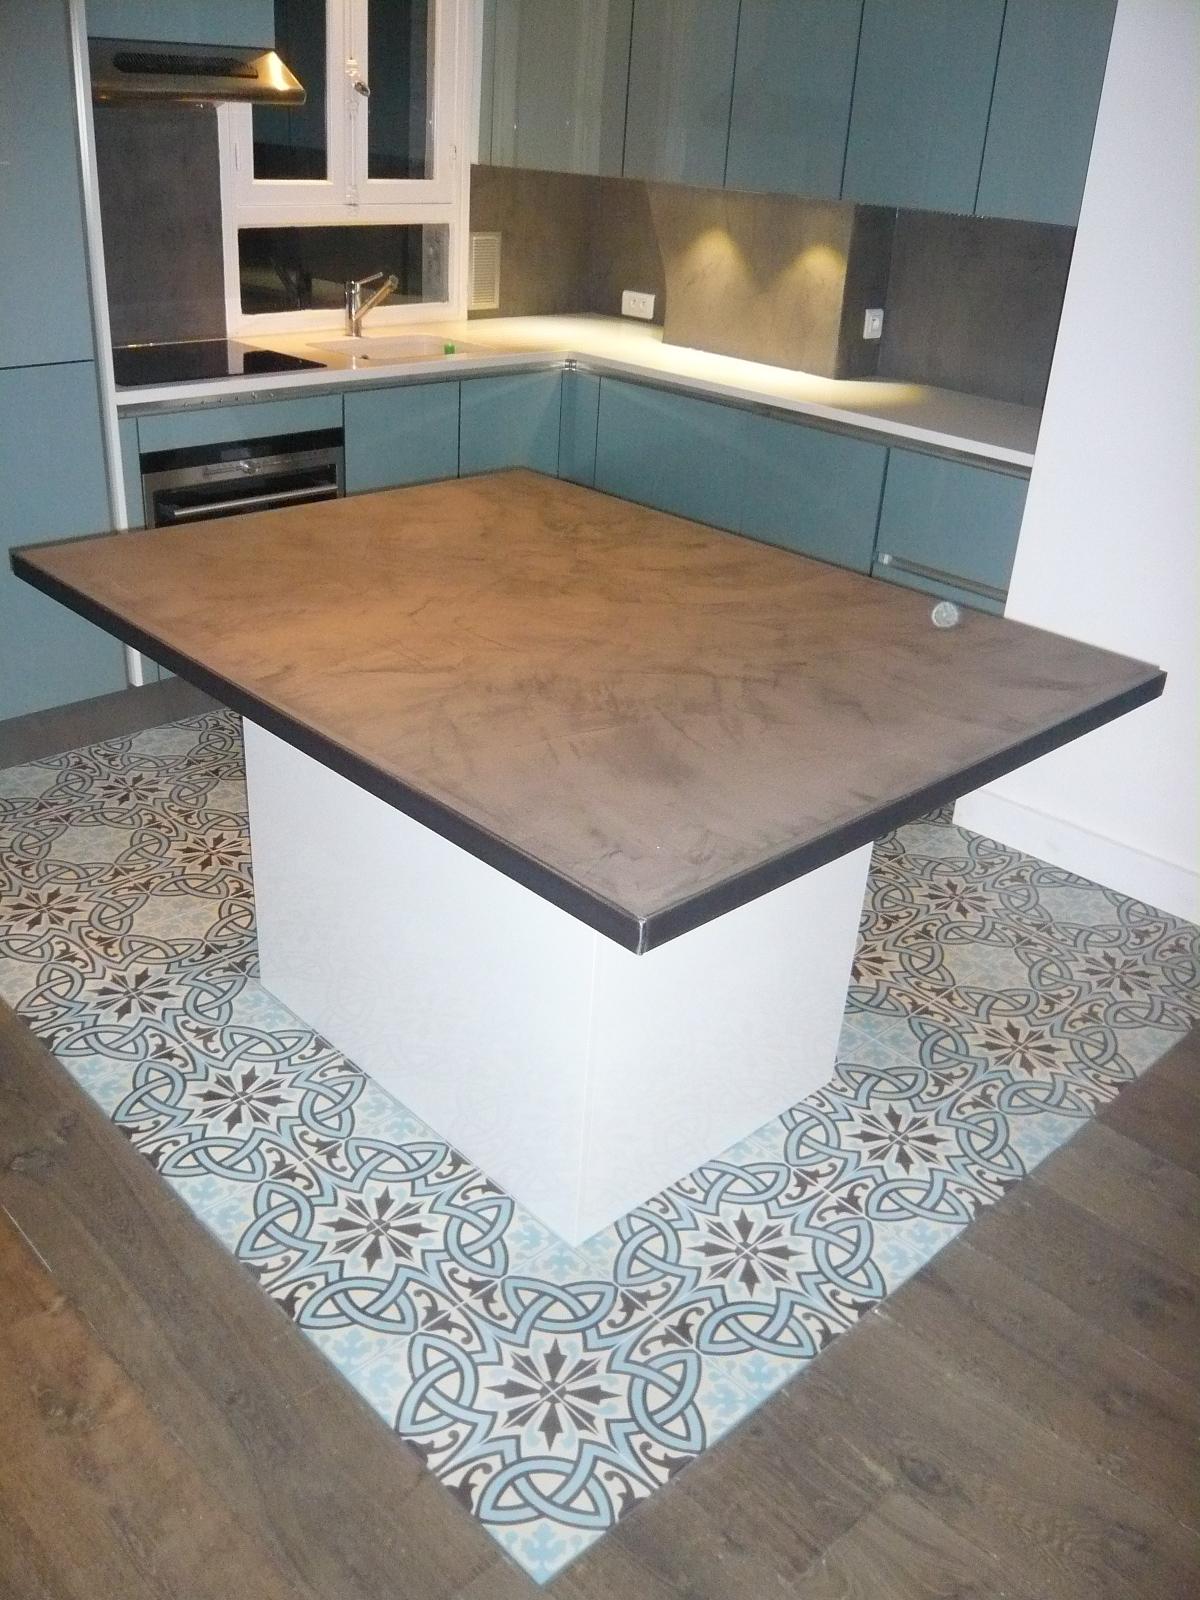 brok n deco credence et ilot cuisine beton cire tommettes esprit bistrot. Black Bedroom Furniture Sets. Home Design Ideas